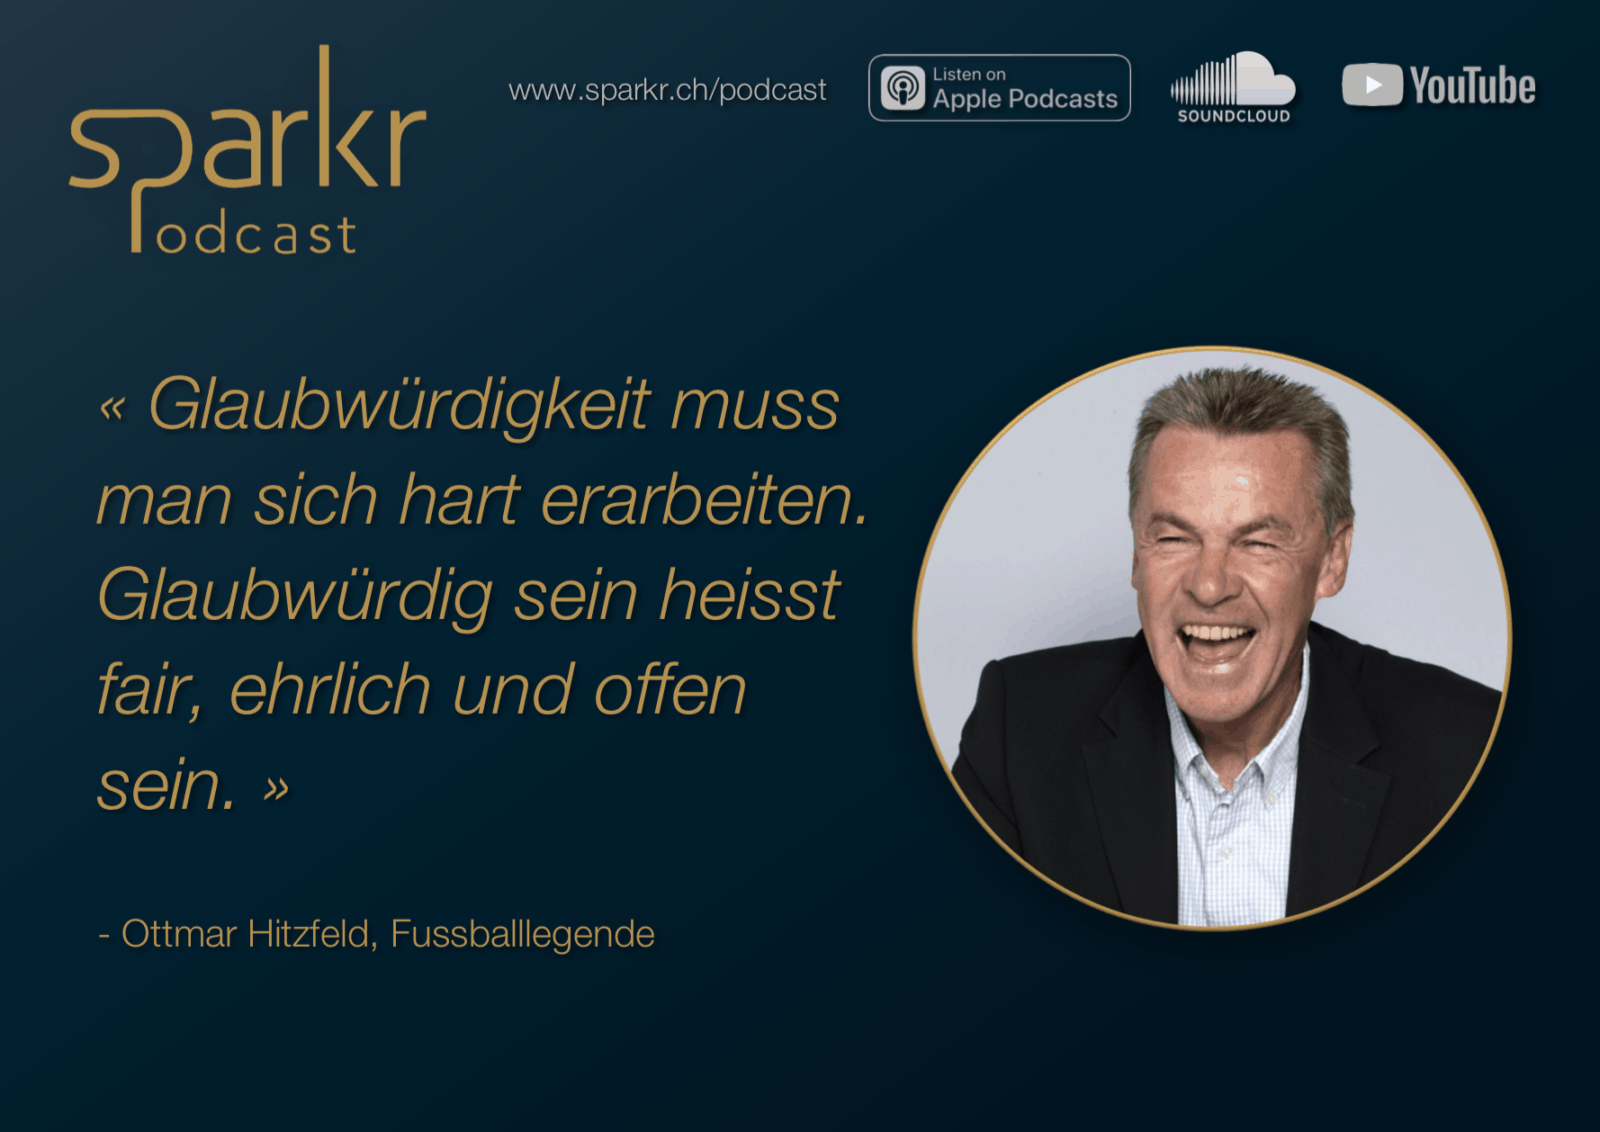 Sparkr Podcast Quote Ottmar Hitzfeld Glaubwürdigkeit